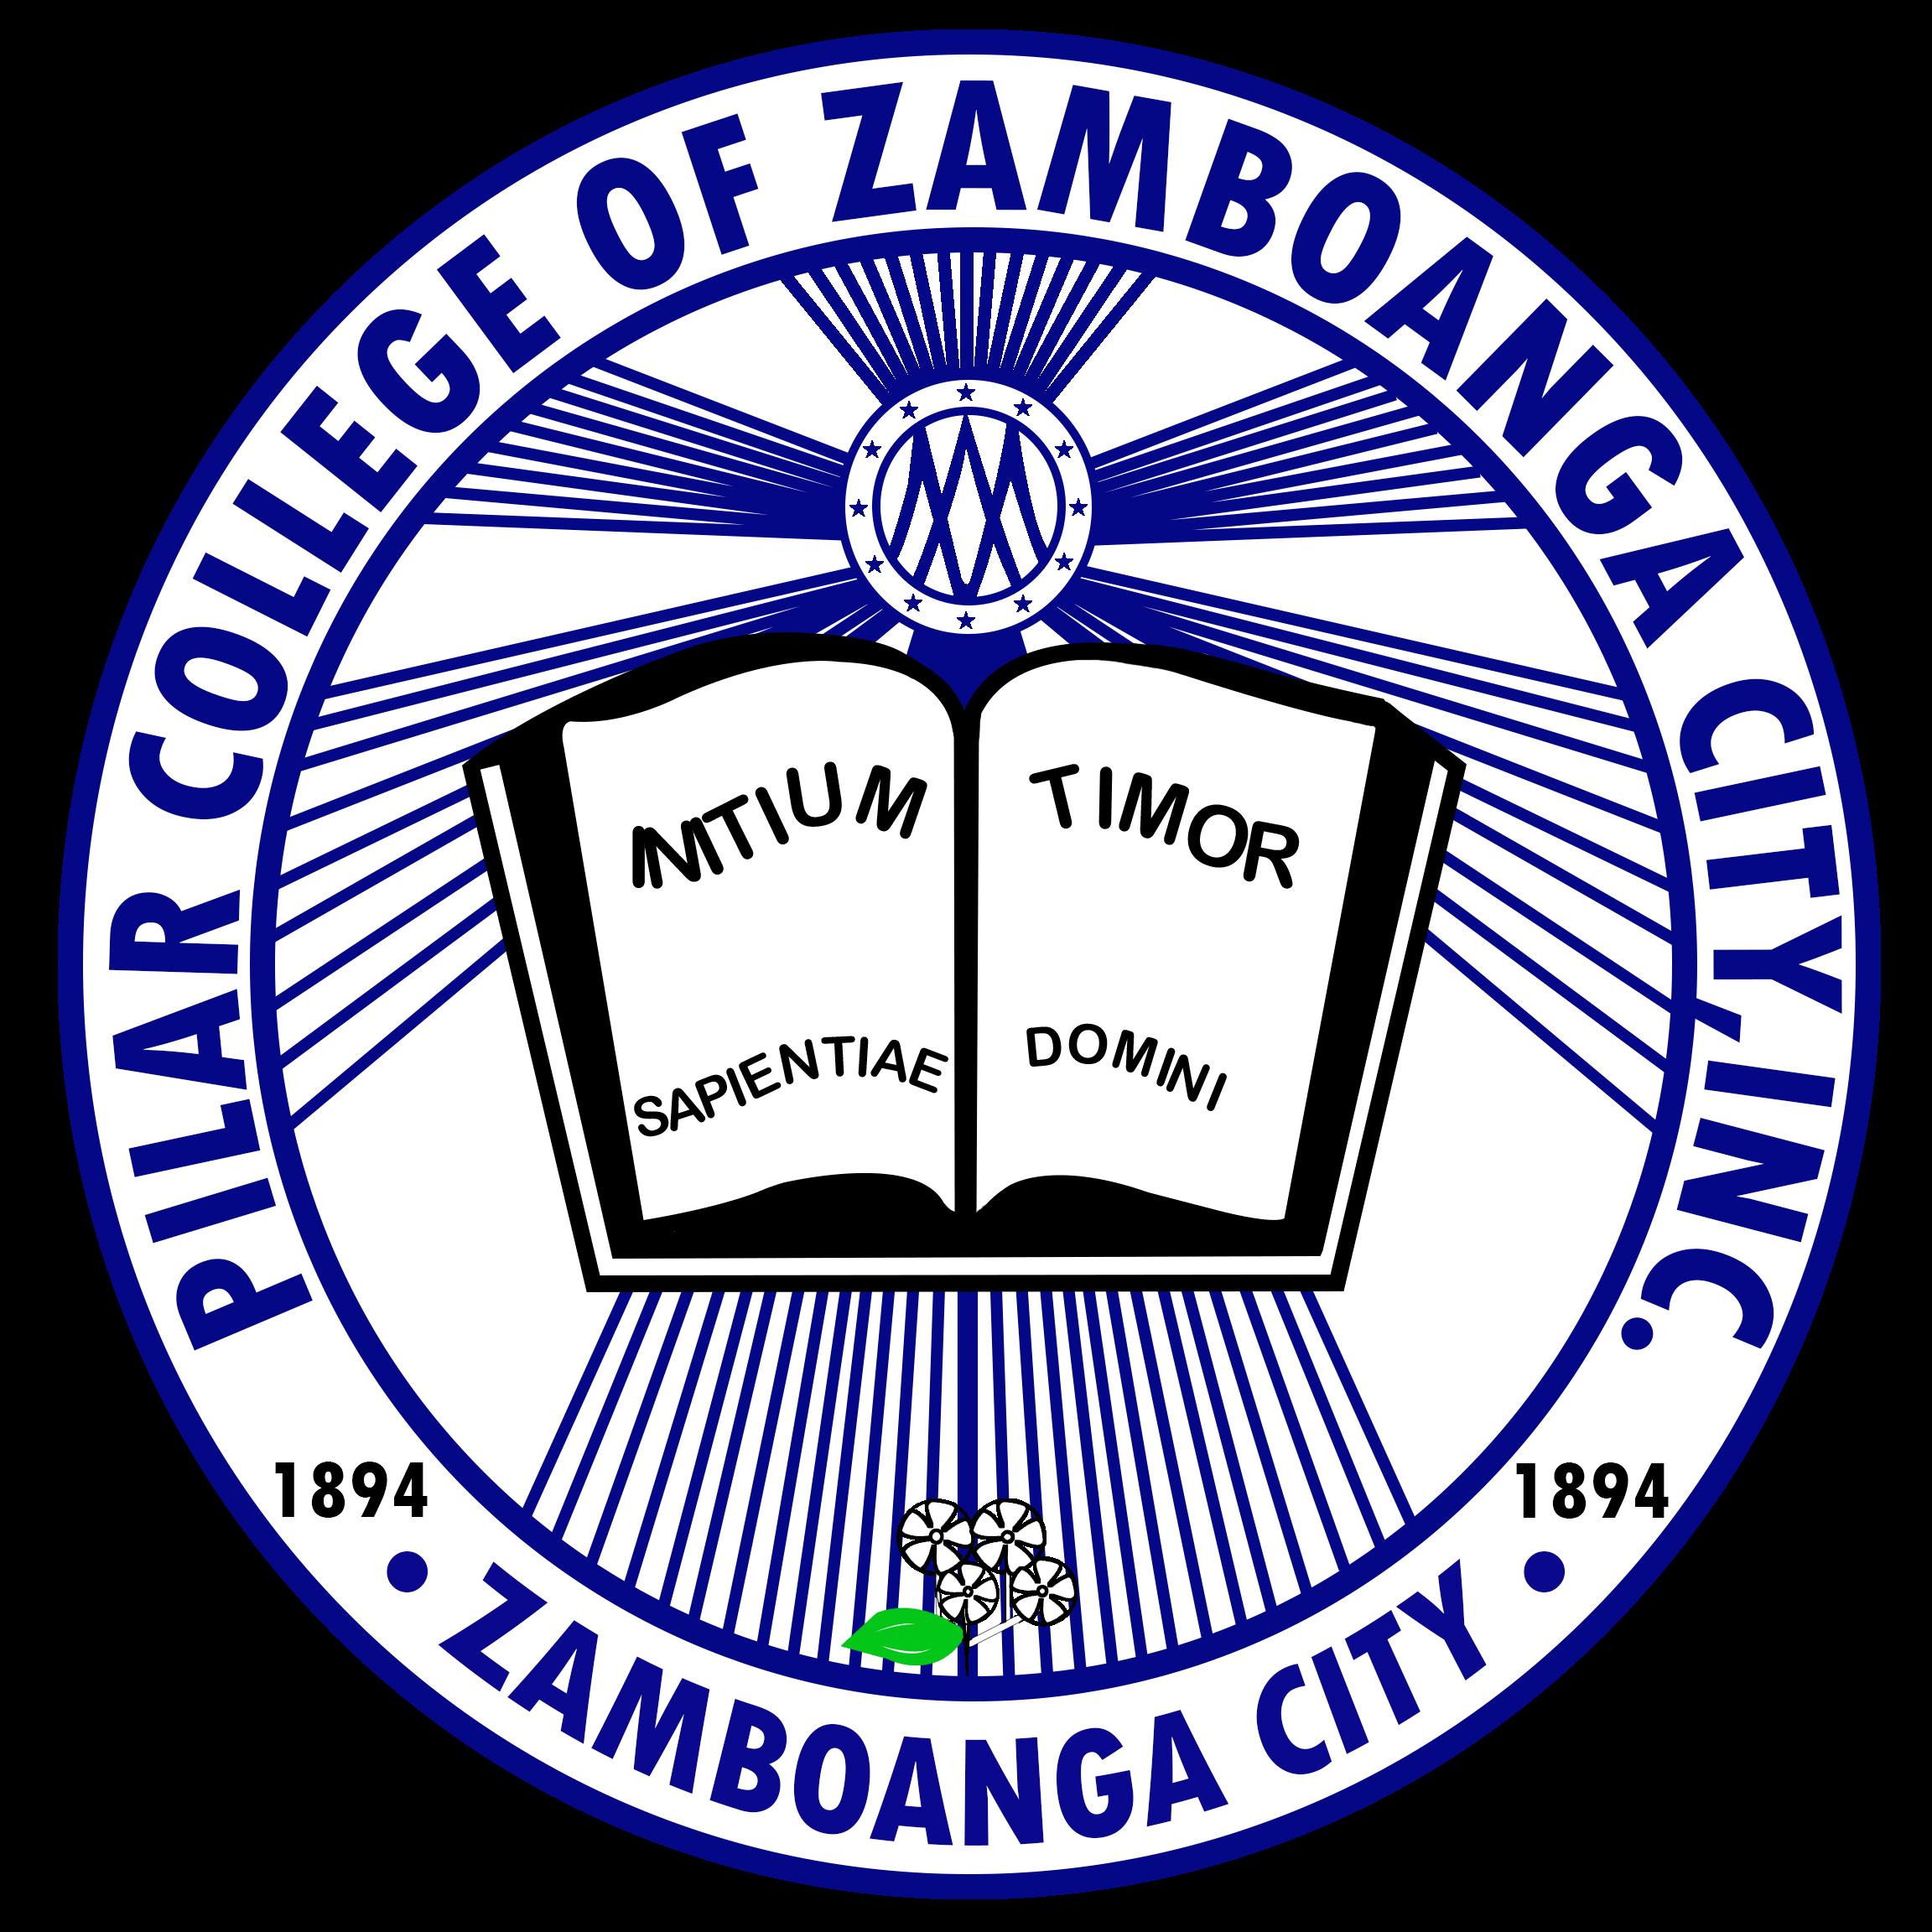 Pilar College of Zamboanga City Inc. Logo